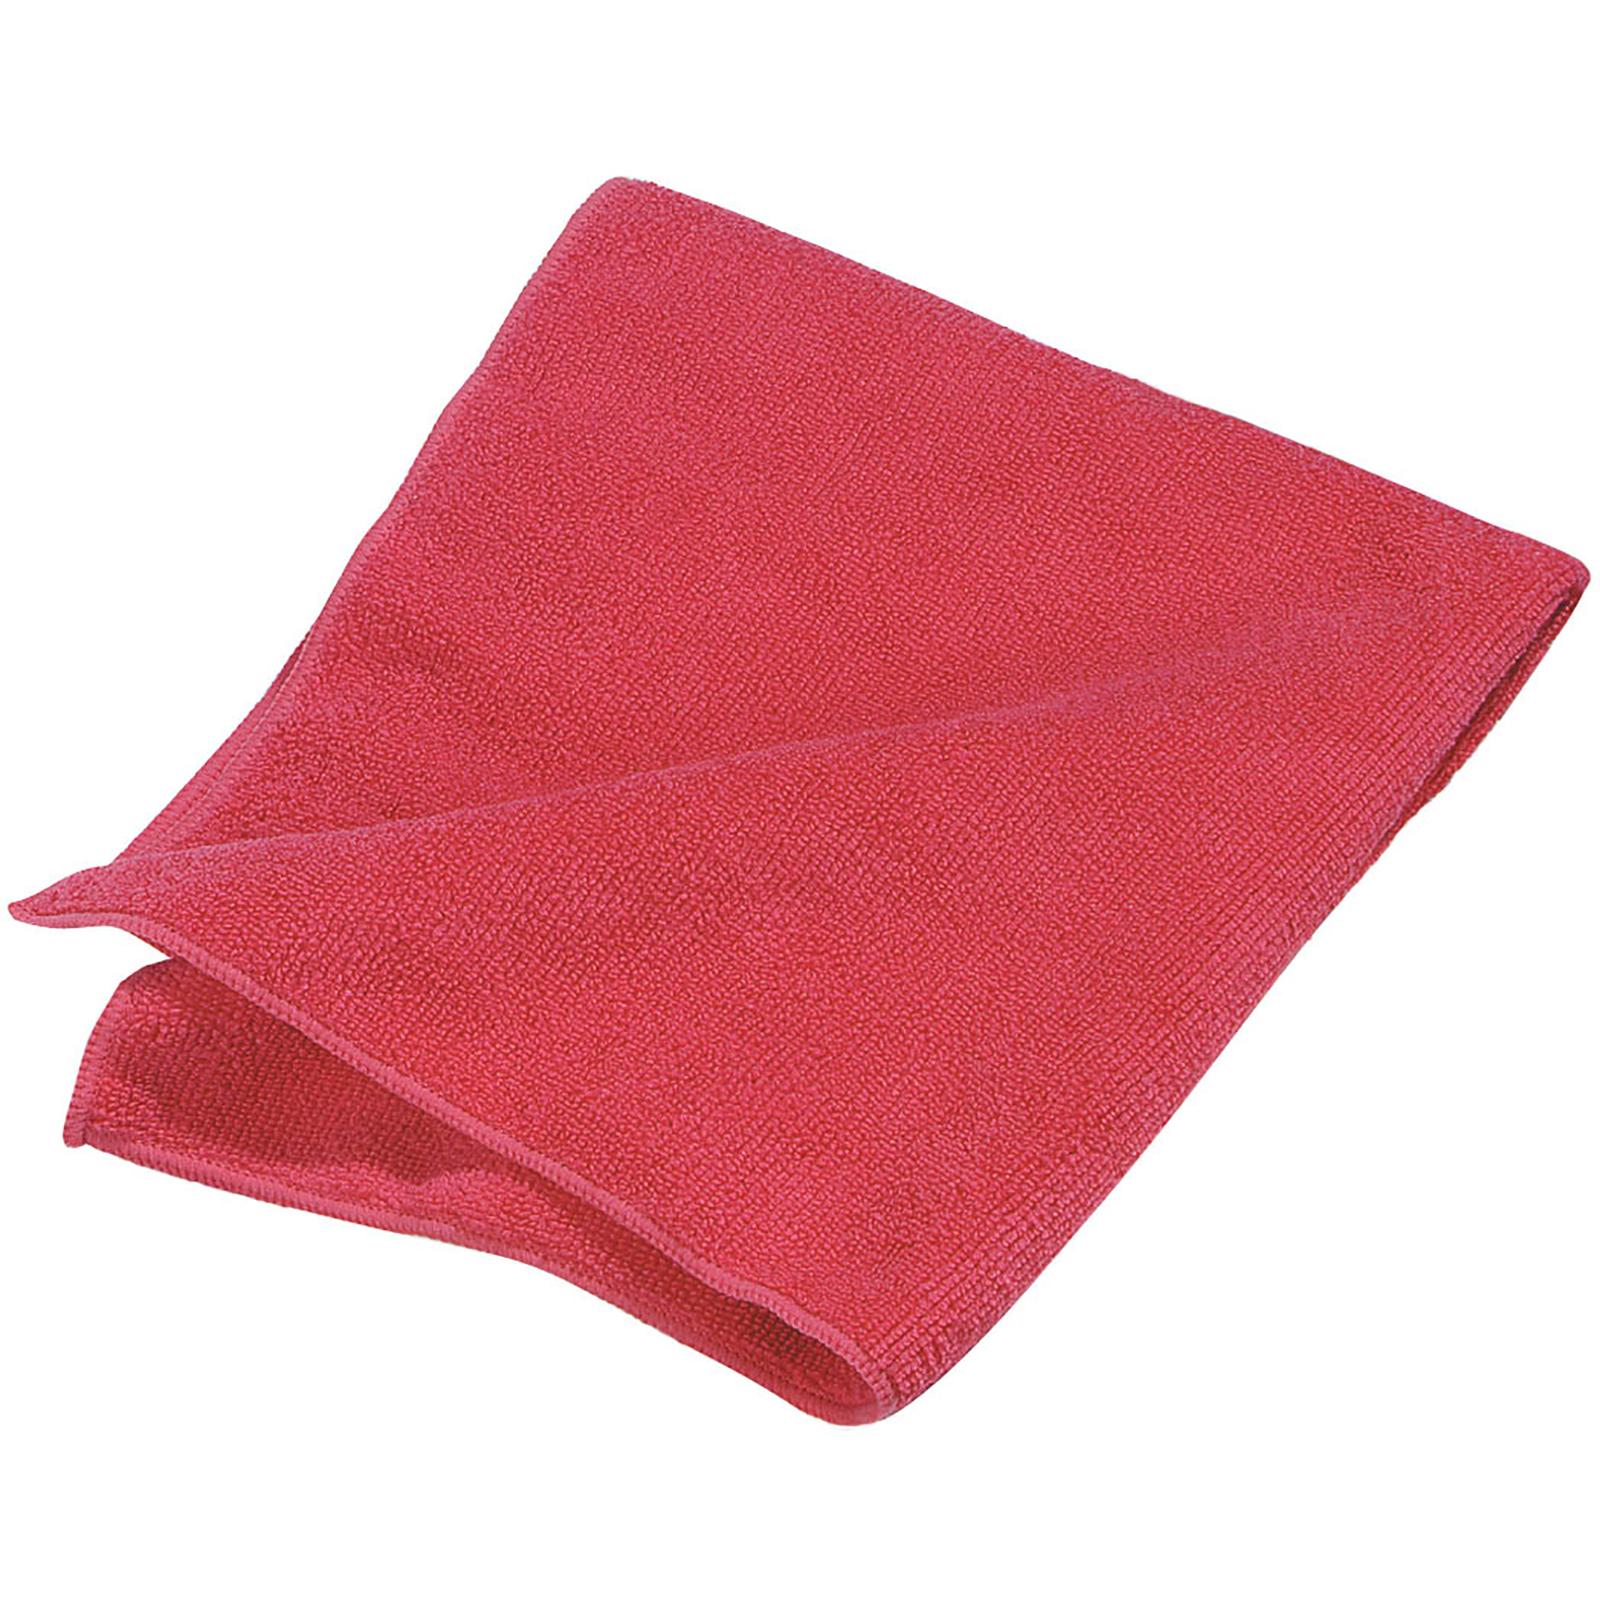 Carlisle 3633405 towel / cloth / mitts, microfiber